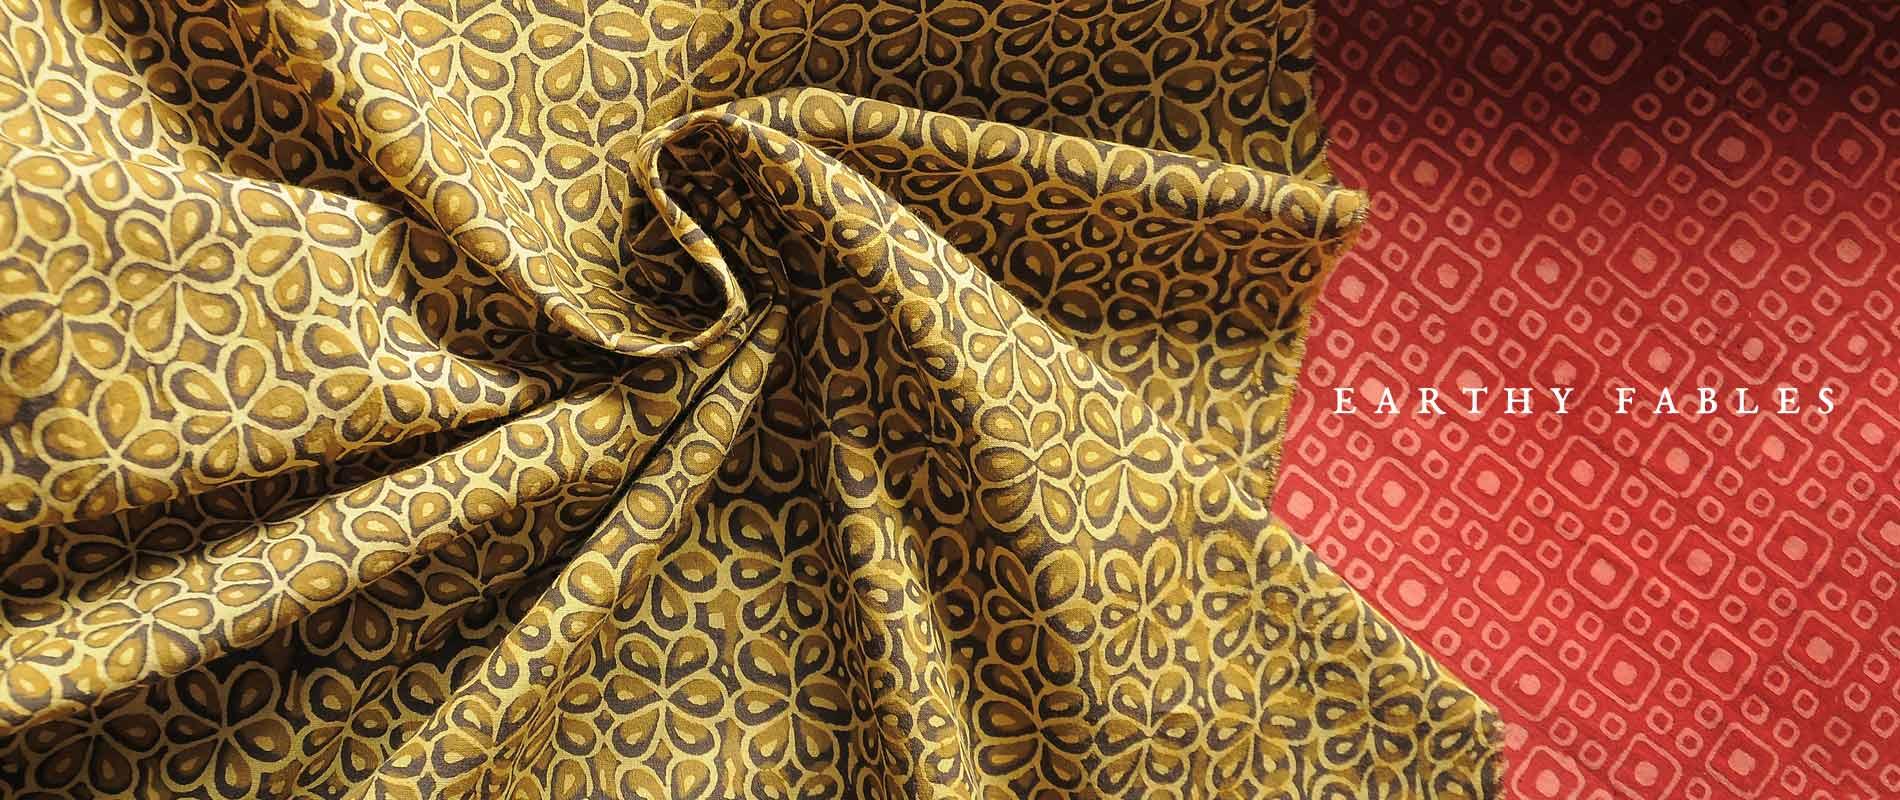 171101MIX024_Mixed_Fabric_8022